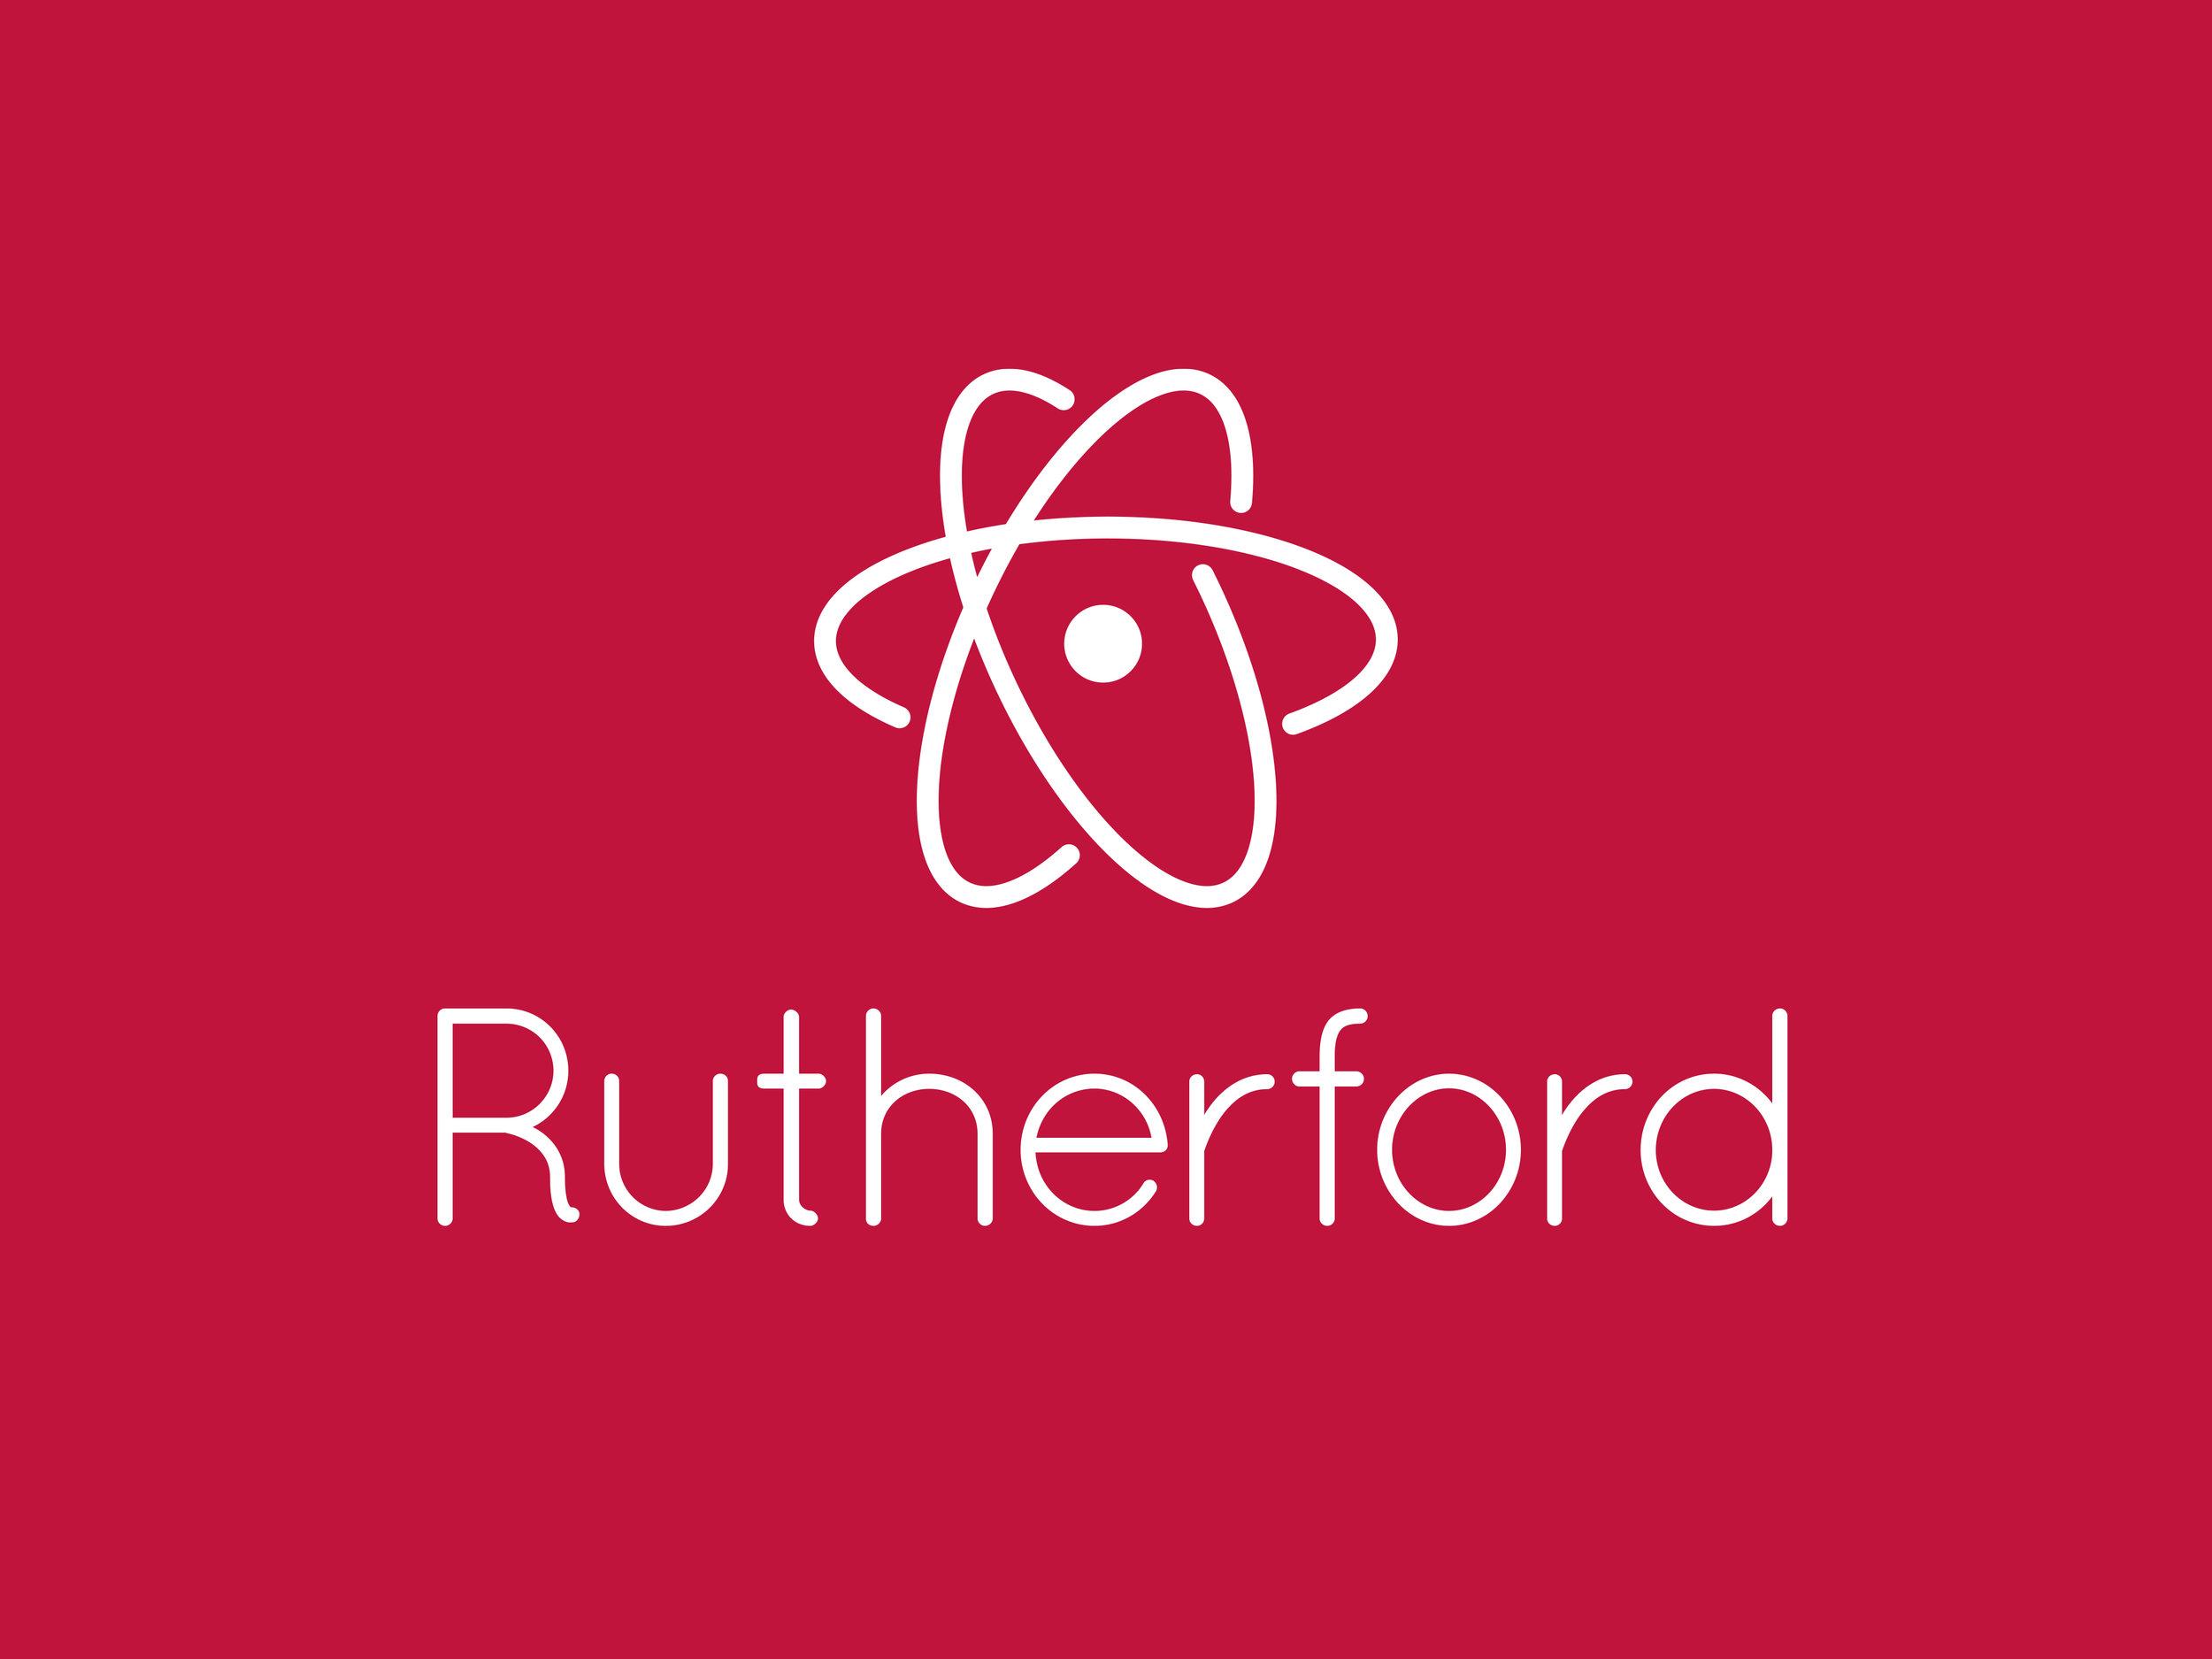 Rutherford_logo.jpg